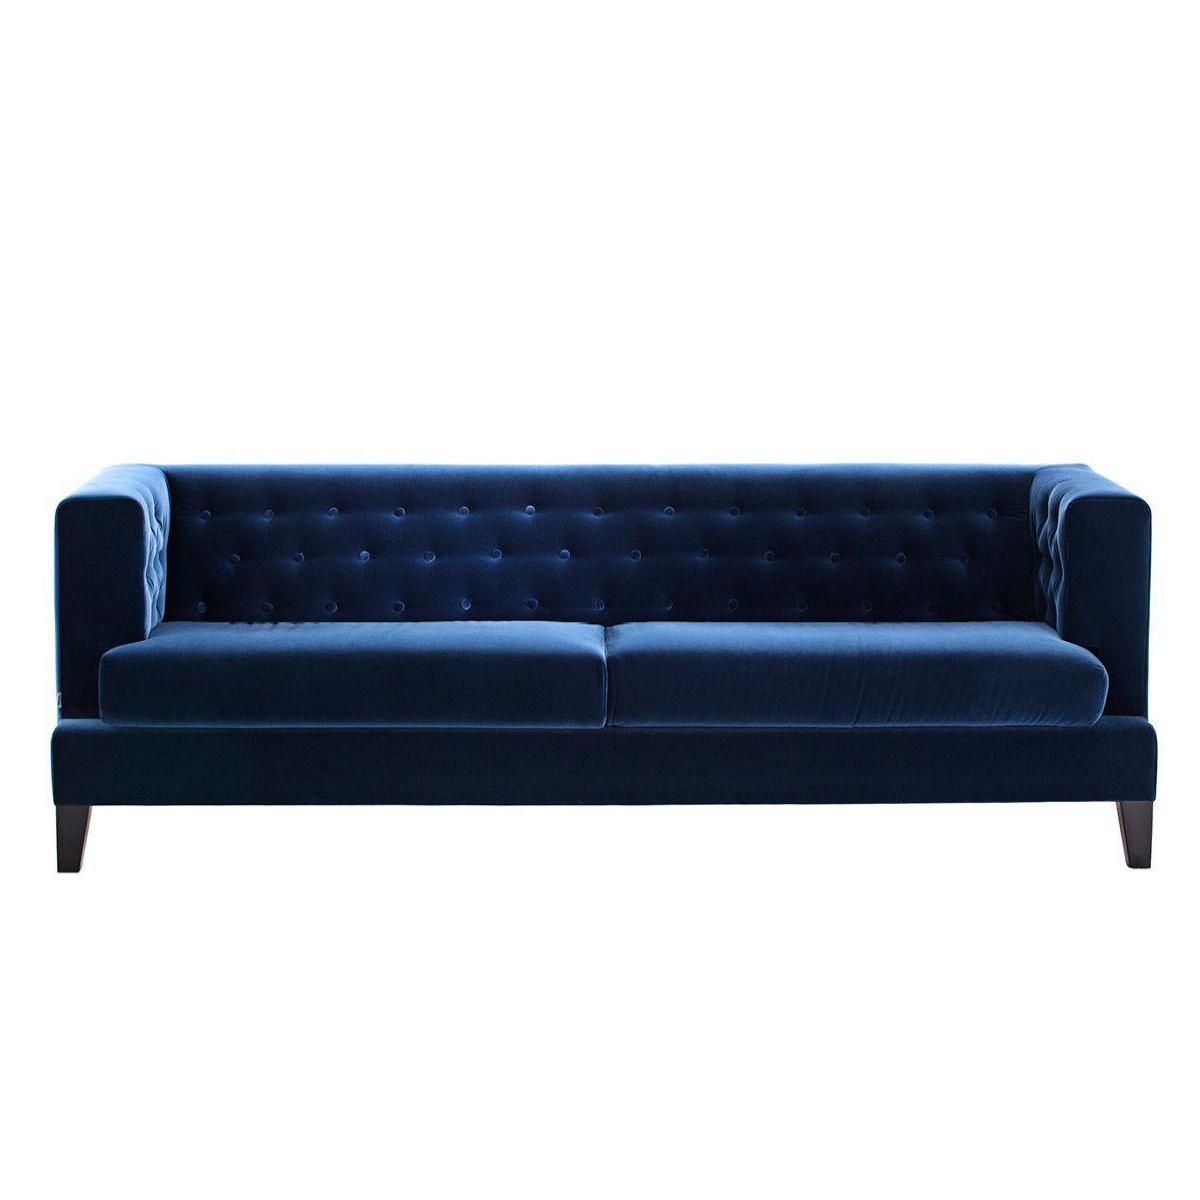 Driade - Canapé 3 de places Hall - bleu/tissu velours Loira Blu 256/PxHxP 230x75x84cm/cadre conglomerate